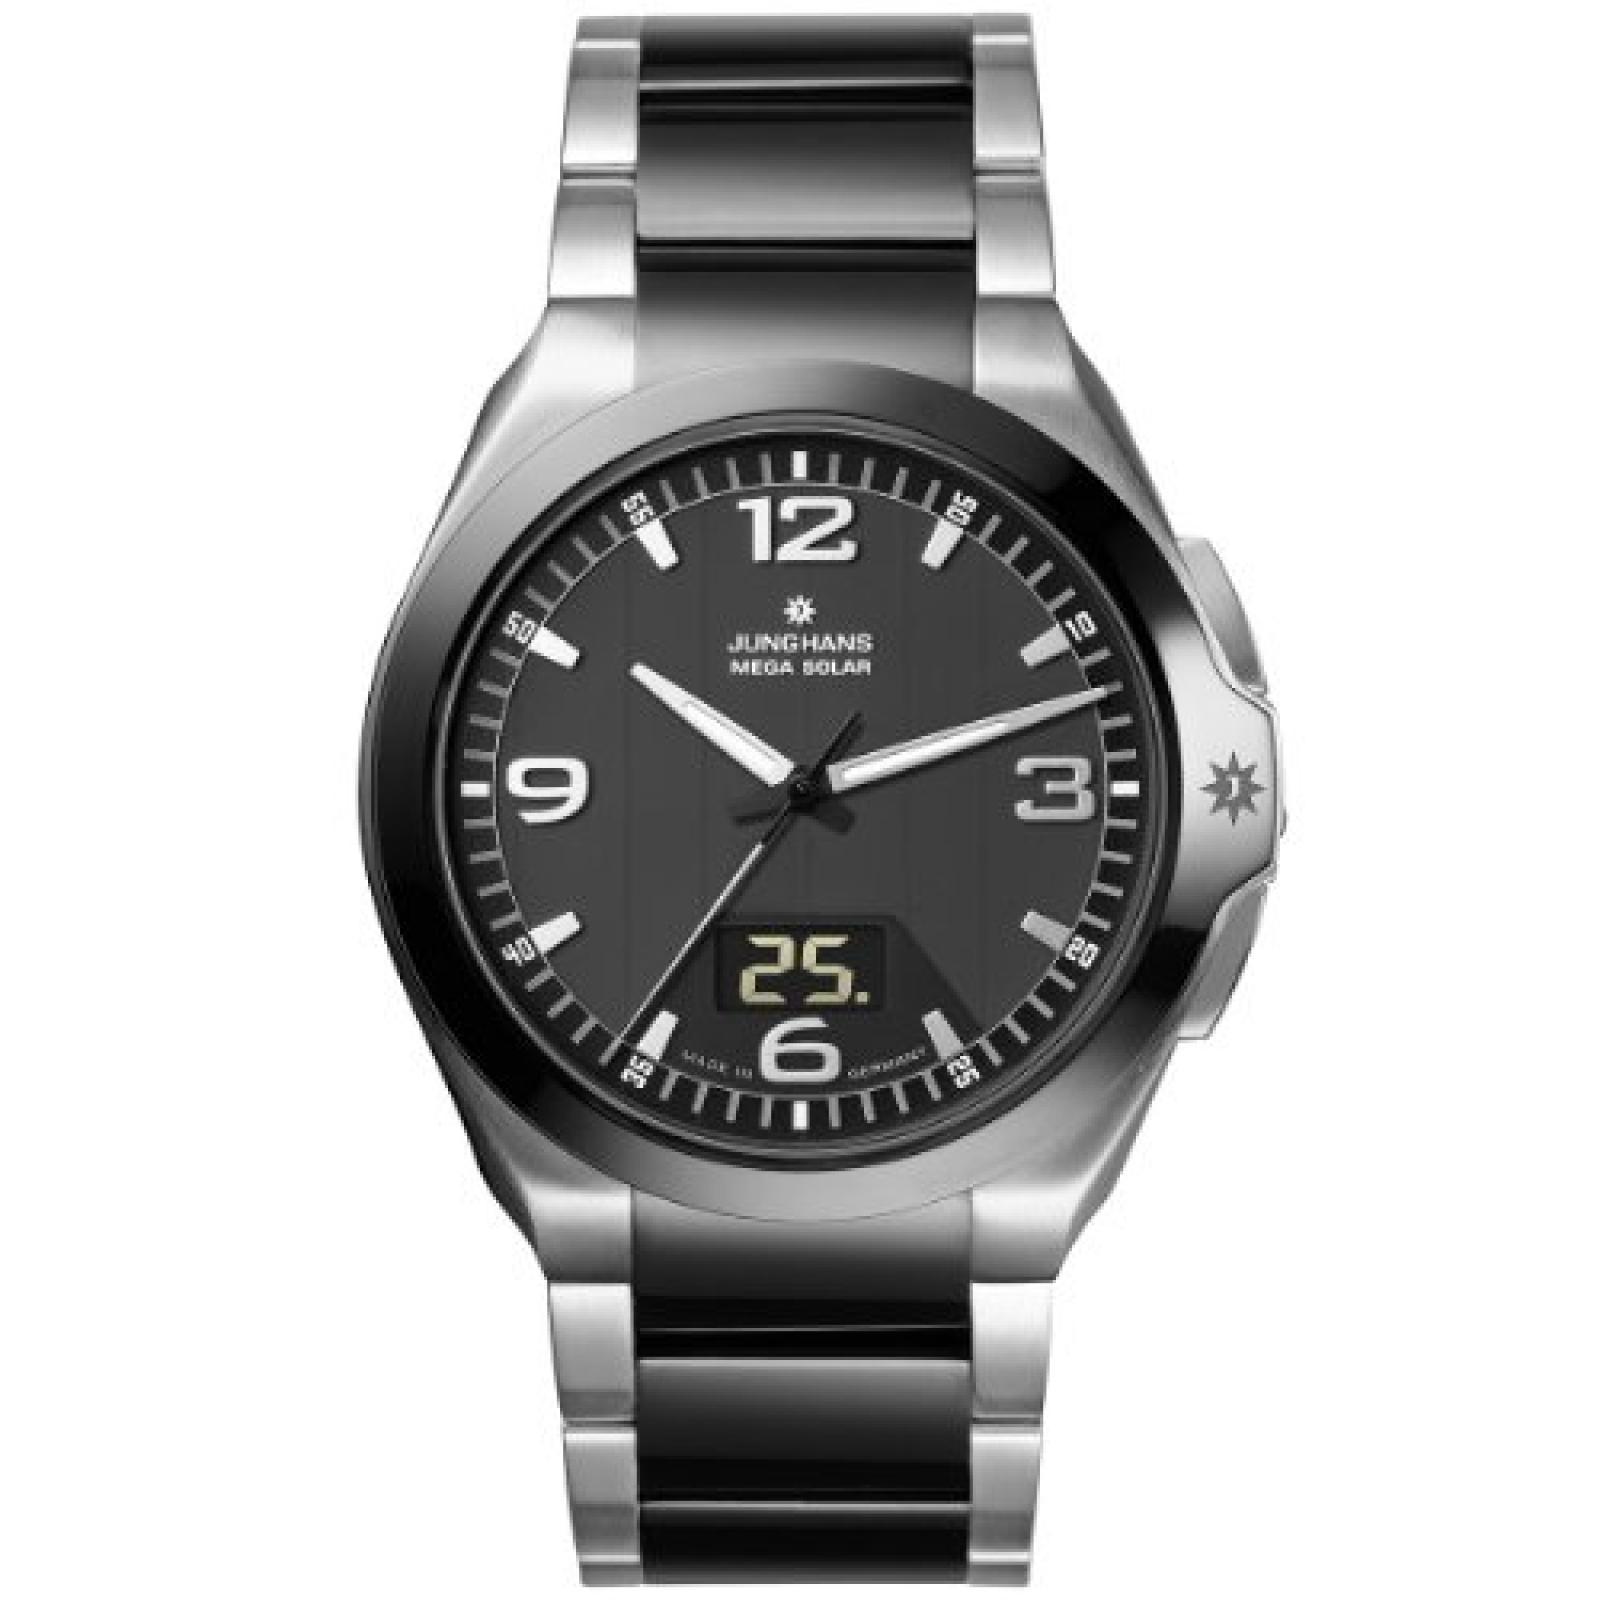 Junghans Herren-Armbanduhr XL Spectrum Analog - Digital verschiedene Materialien 018/1120.44